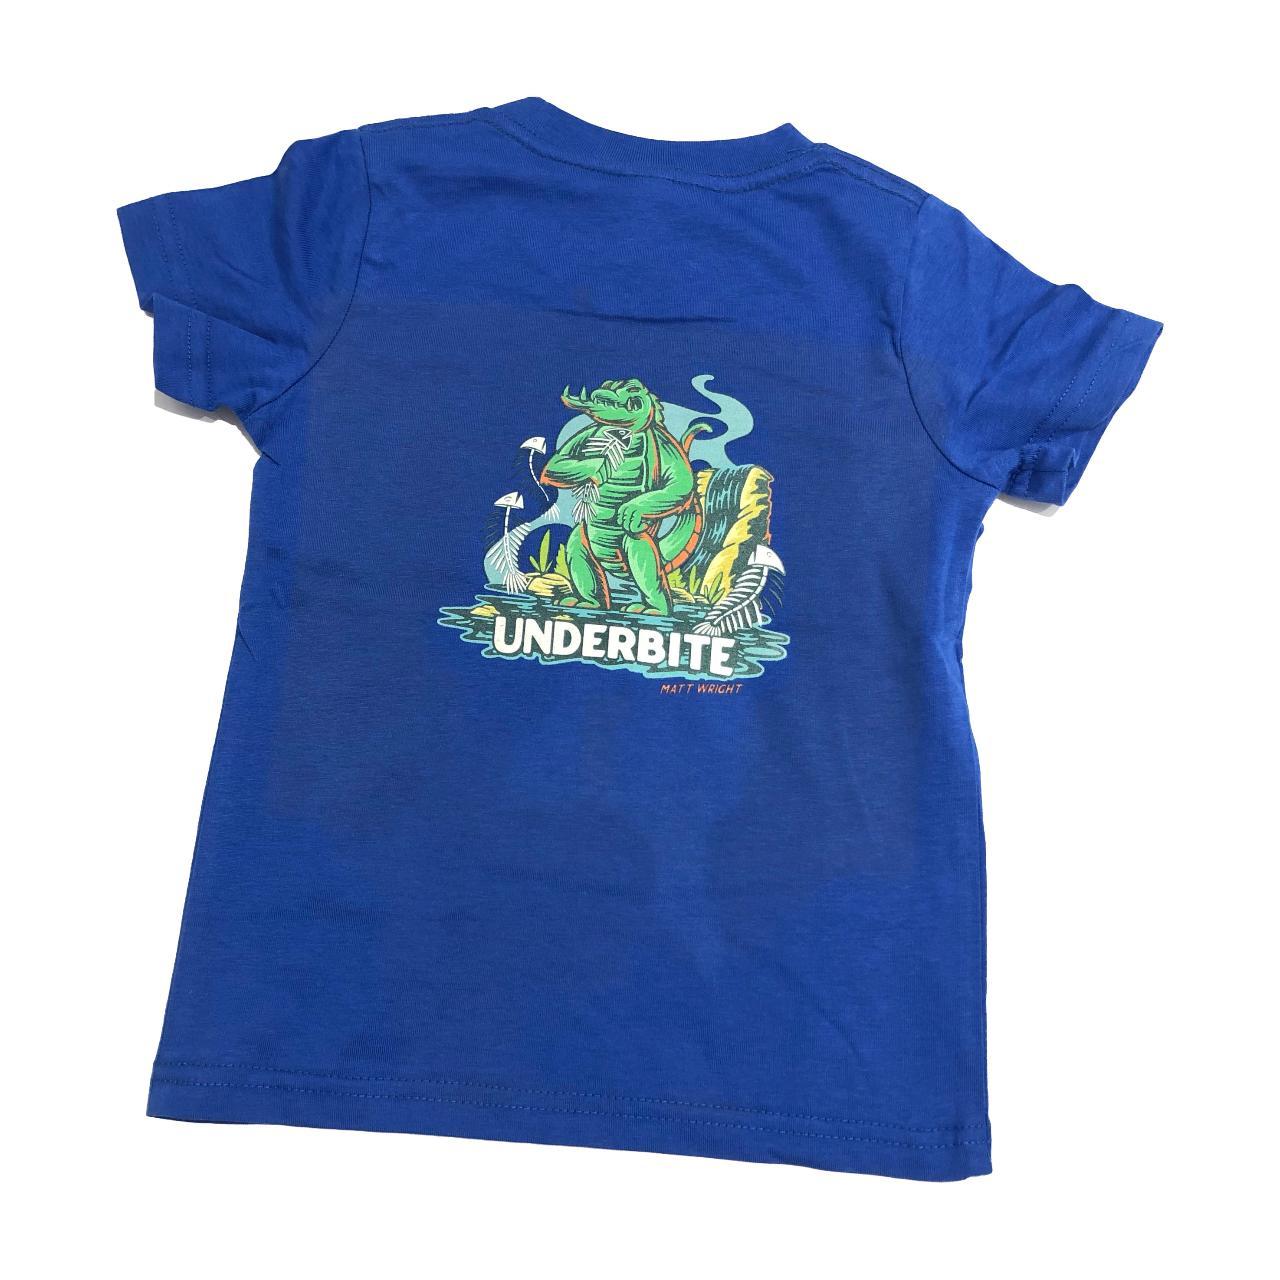 Underbite Kids and Youth Tee Unisex